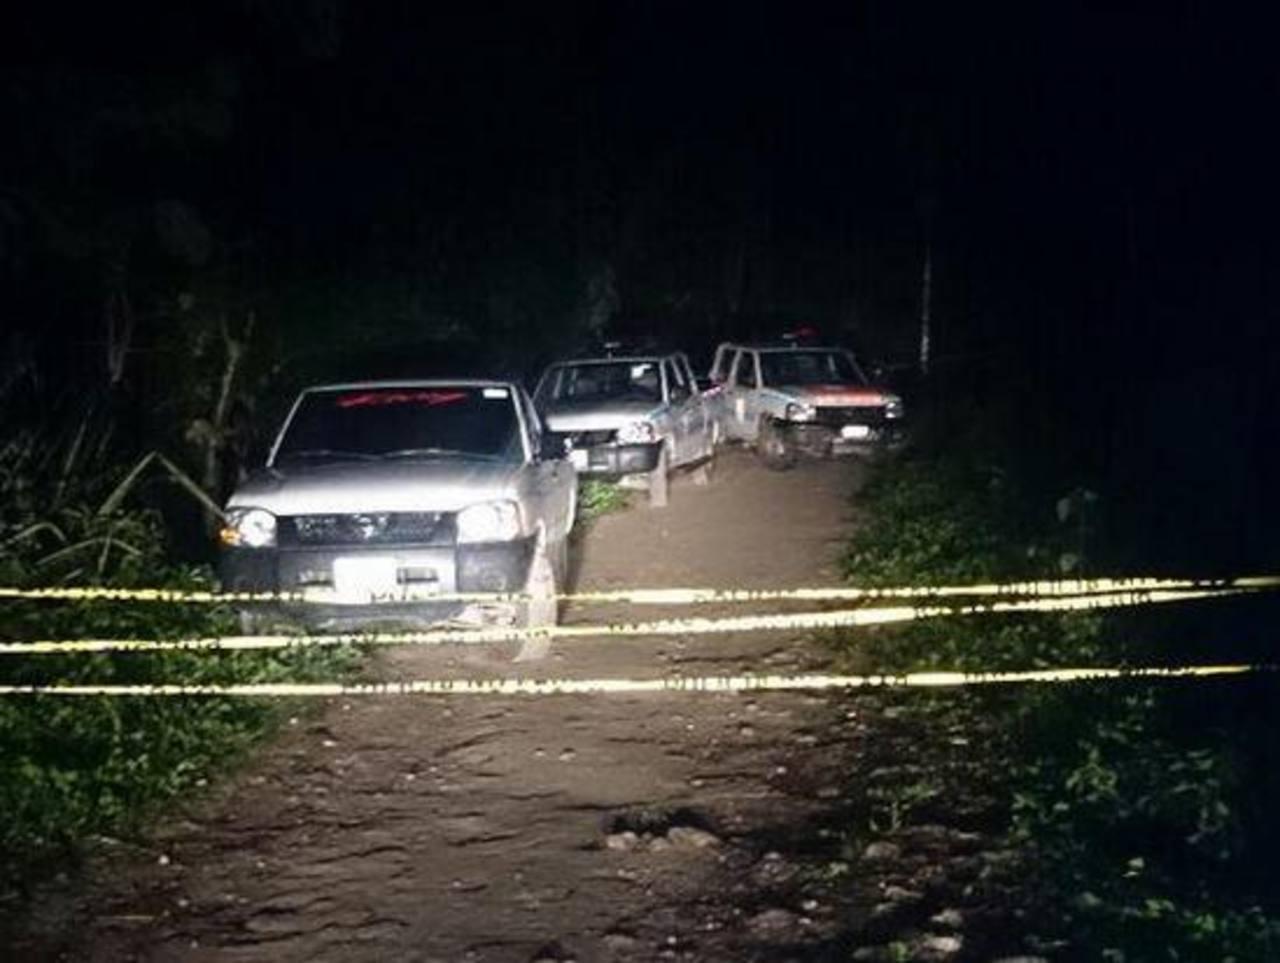 En cantón Tecoluco, San Pedro Perulapán, Cuscatlán, fueron asesinados esta noche Guillermo Sánchez, de 50 años, y José Girón, de 42, ambos agricultores